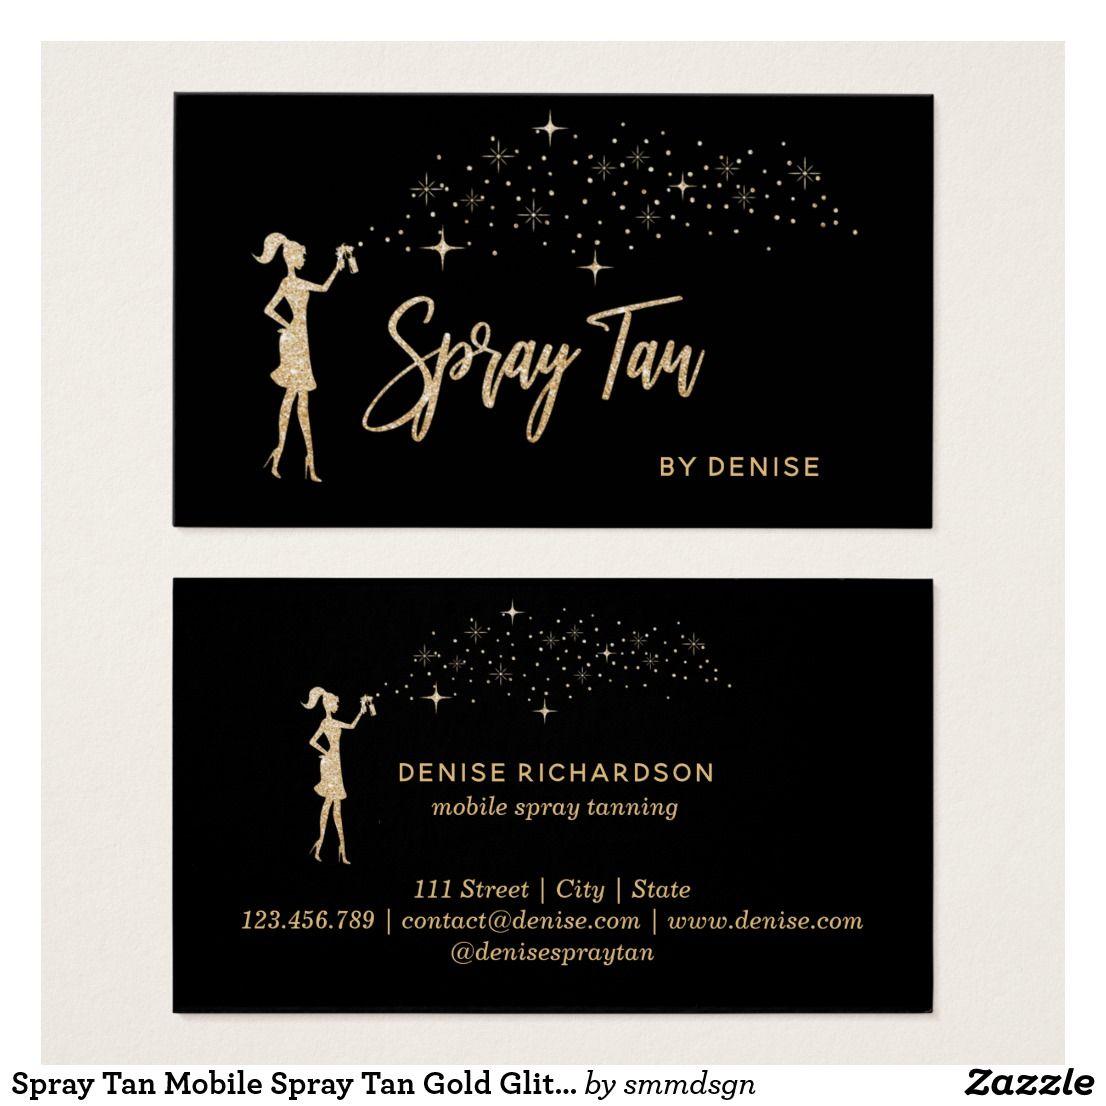 Spray Tan Mobile Spray Tan Gold Glittering Girl Business Card Mobile Spray Tanning Spray Tanning Spray